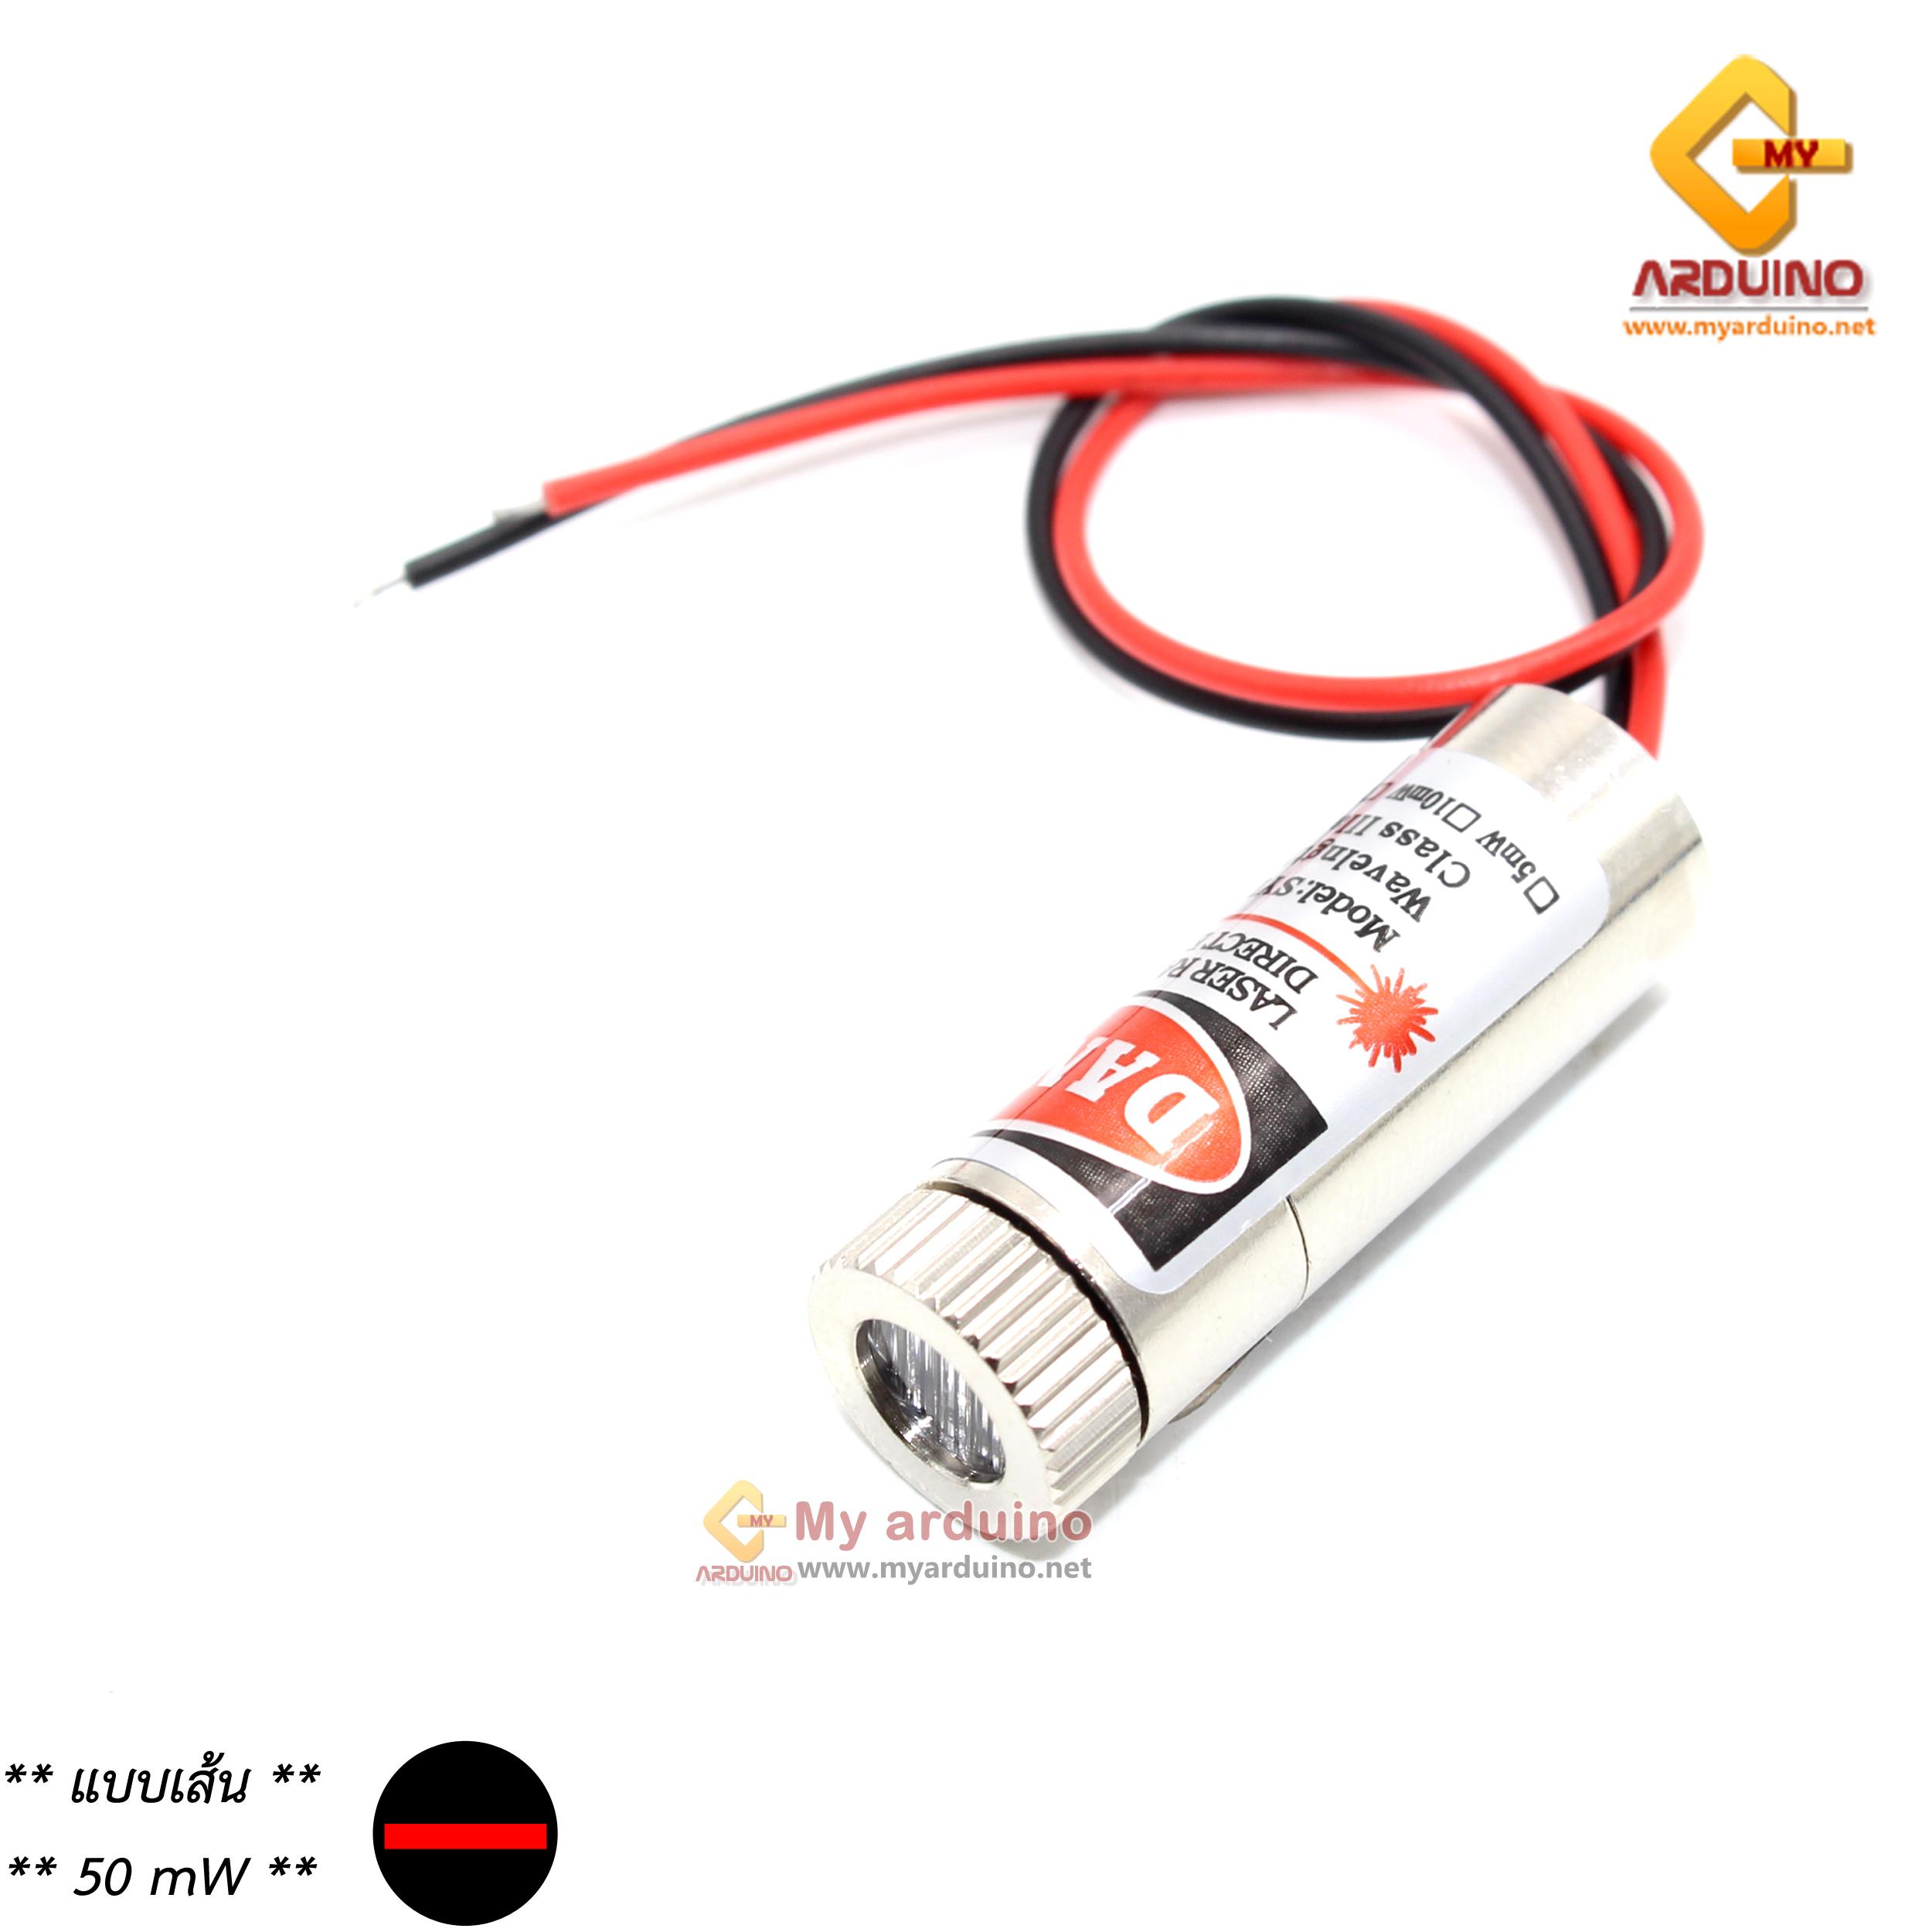 Laser 50mW 650NM เลเซอร์สีแดง แบบเส้นตรง - ขาย Arduino อุปกรณ์ Arduino  คุณภาพดี ราคาถูก ส่งไว ส่งฟรี : Inspired by LnwShop.com